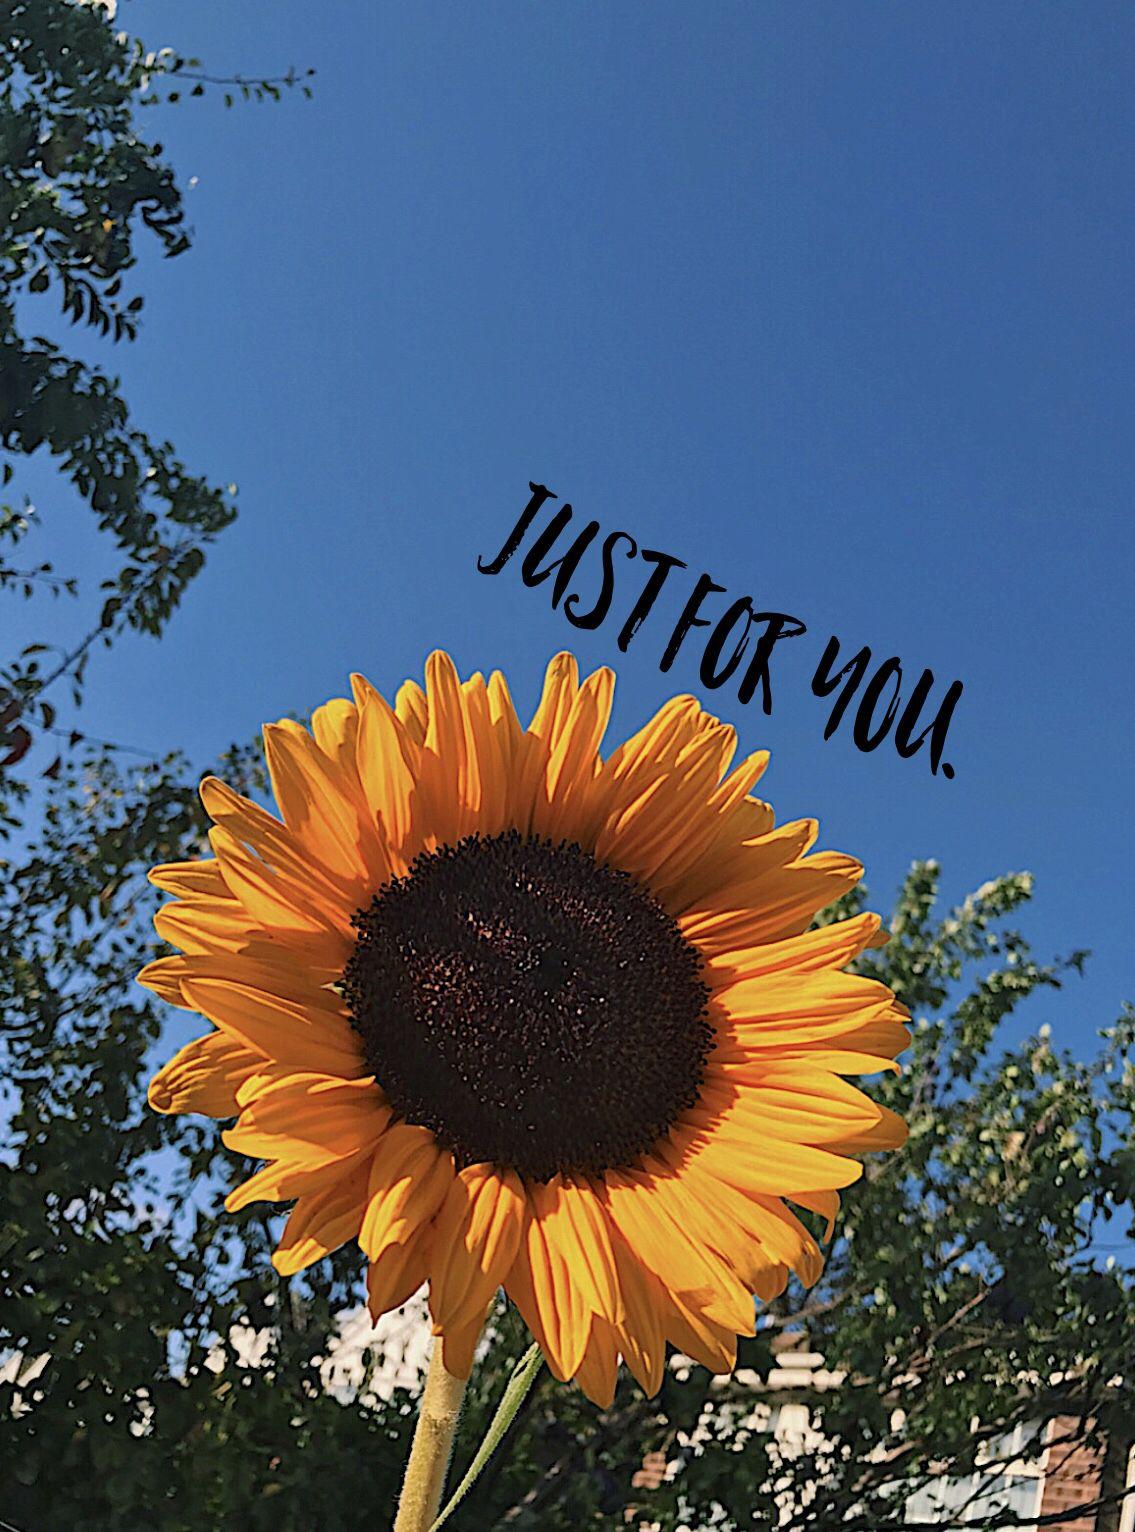 Cute Aesthetic Sunflower Wallpaper | 3D Wallpapers